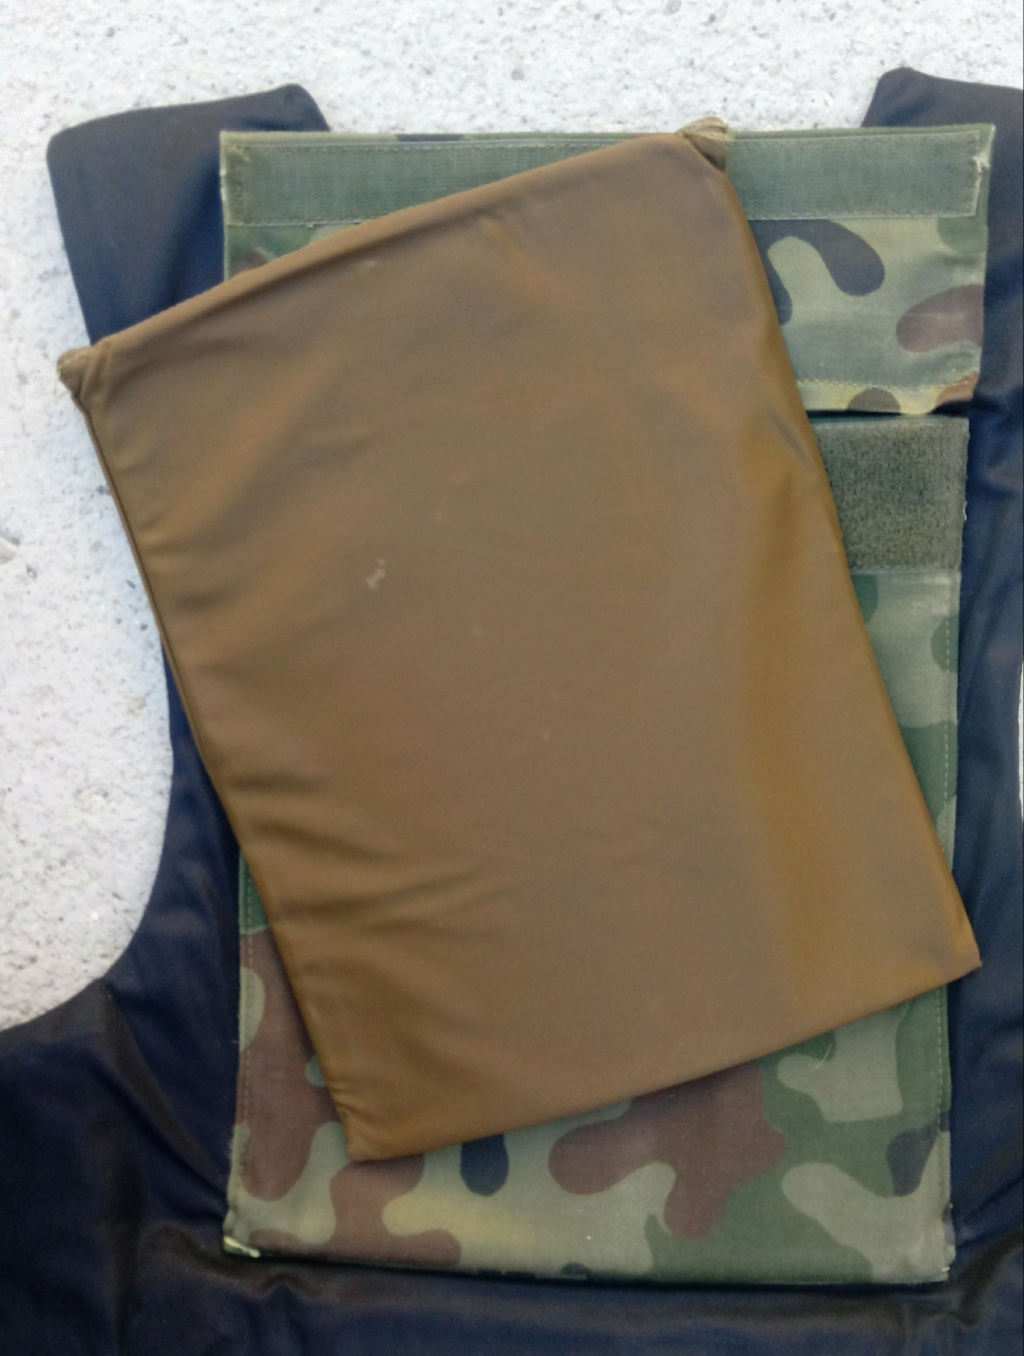 1990s Polish body armor vest - OCHRA 10012119